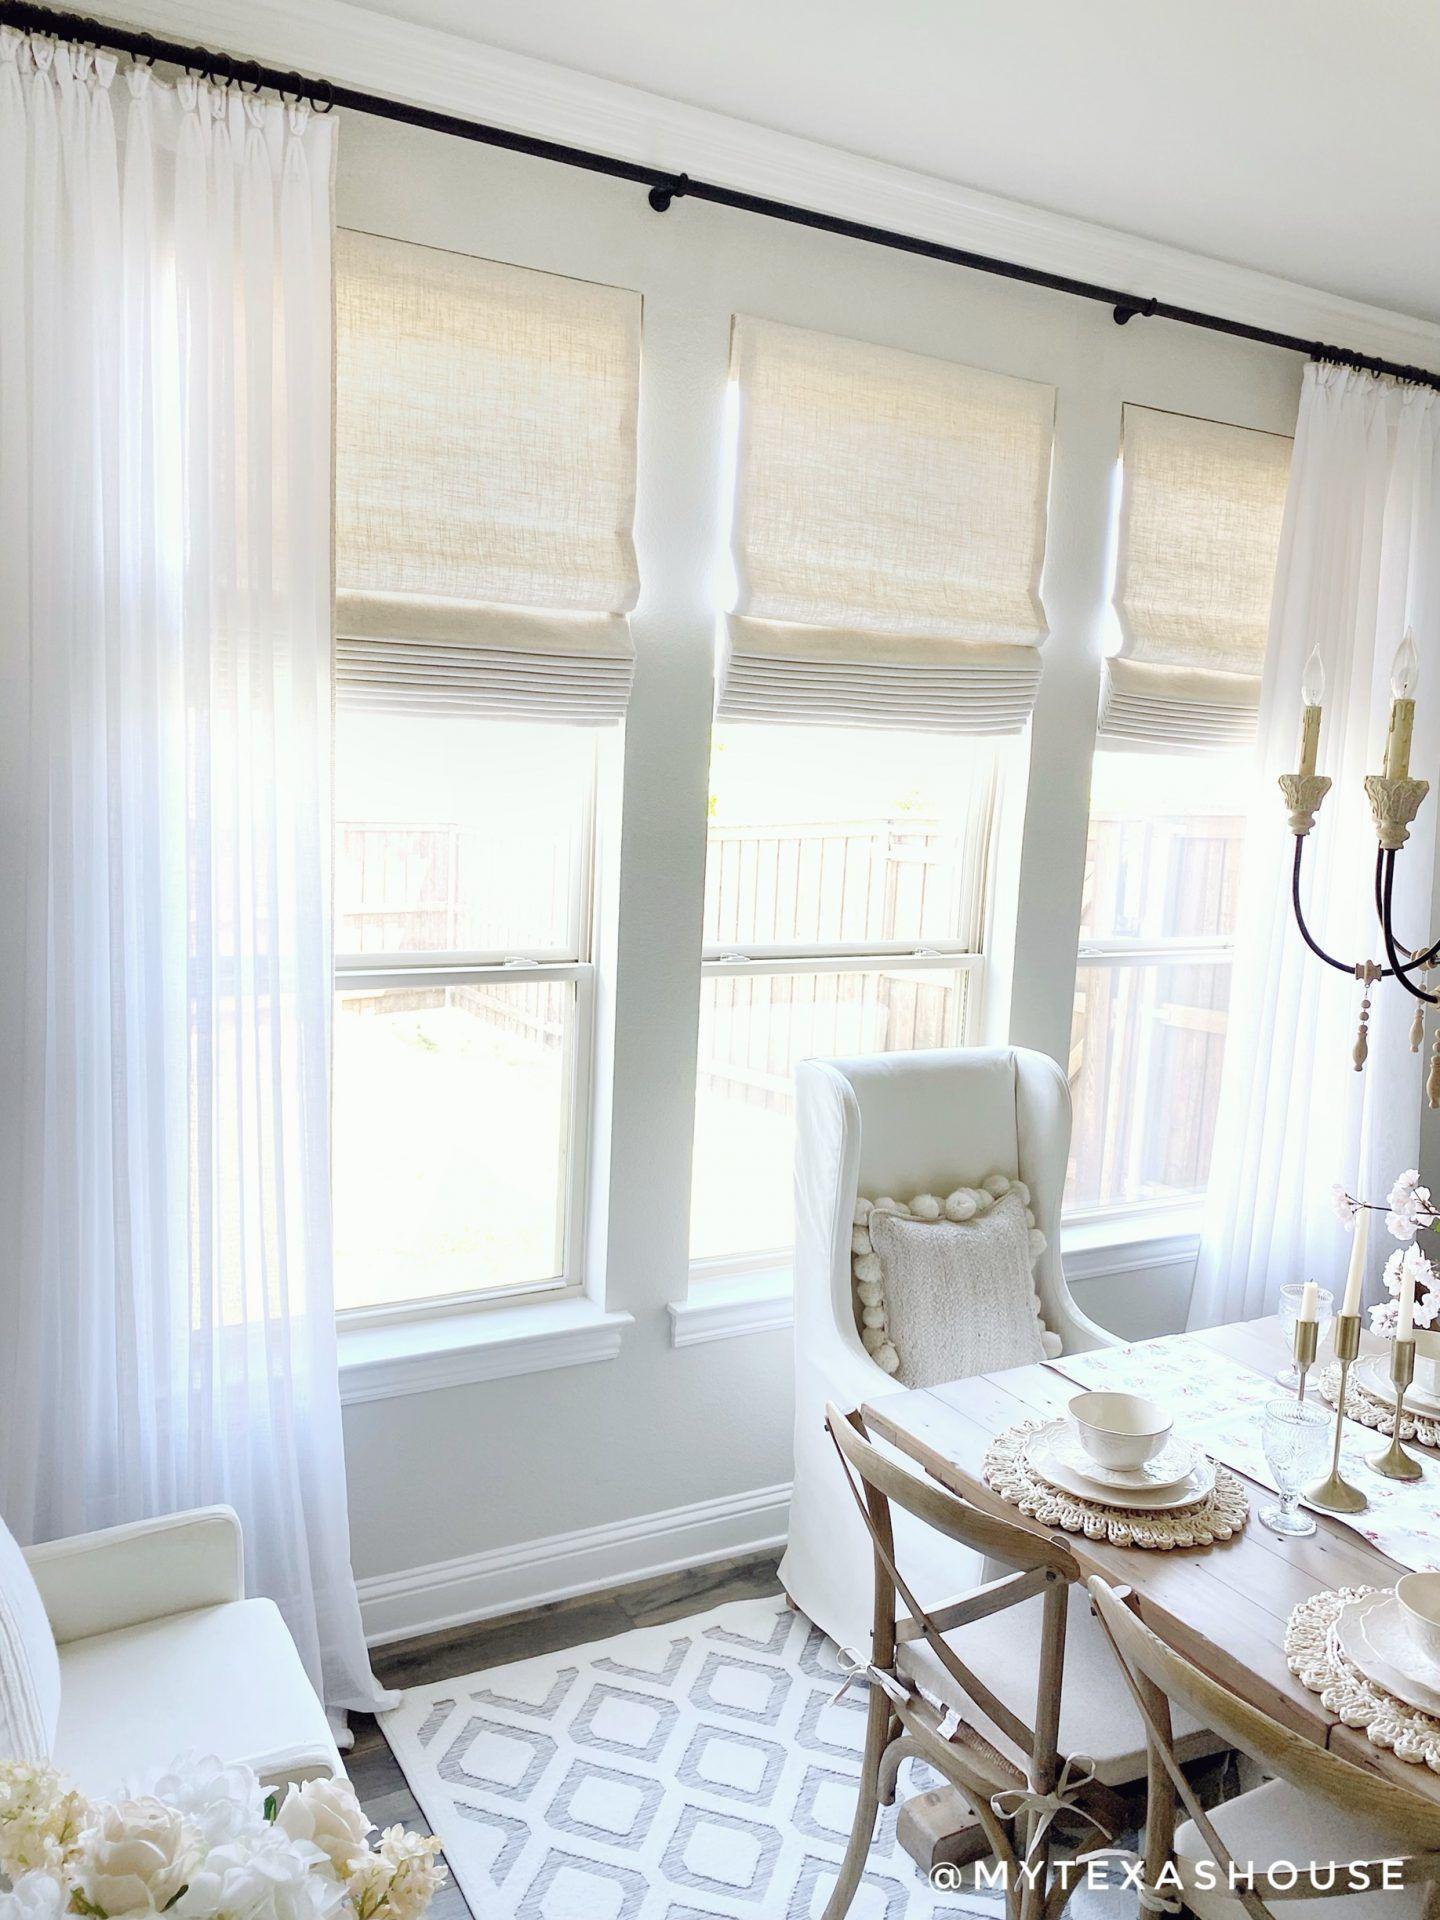 Malbec Linen Roman Shade Willowbloomhome Roman Shades Living Room Curtains Living Room Roman Blinds Living Room